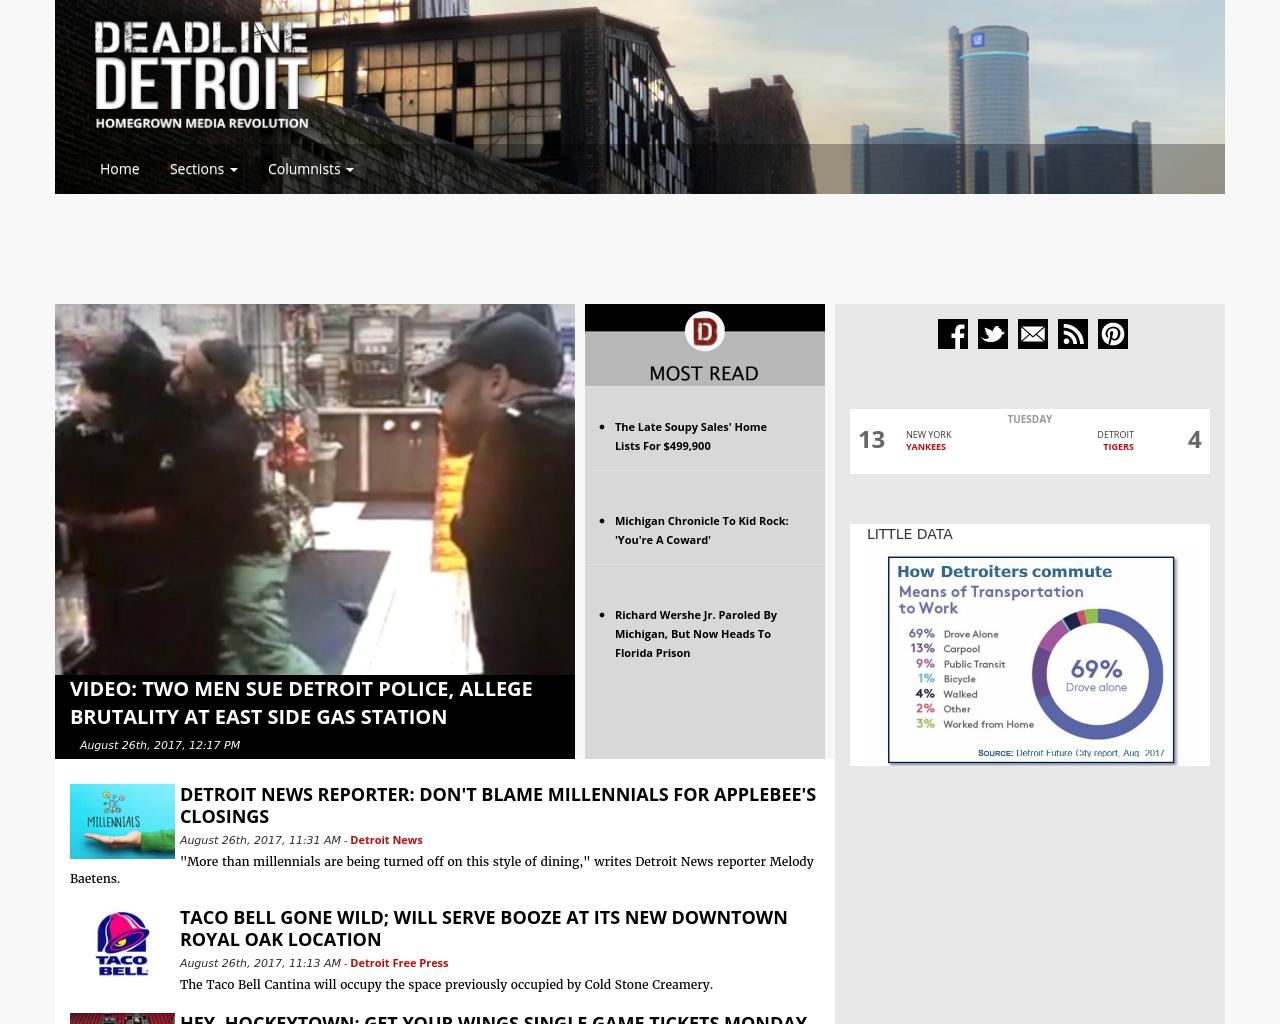 Deadline-Detroit-Advertising-Reviews-Pricing